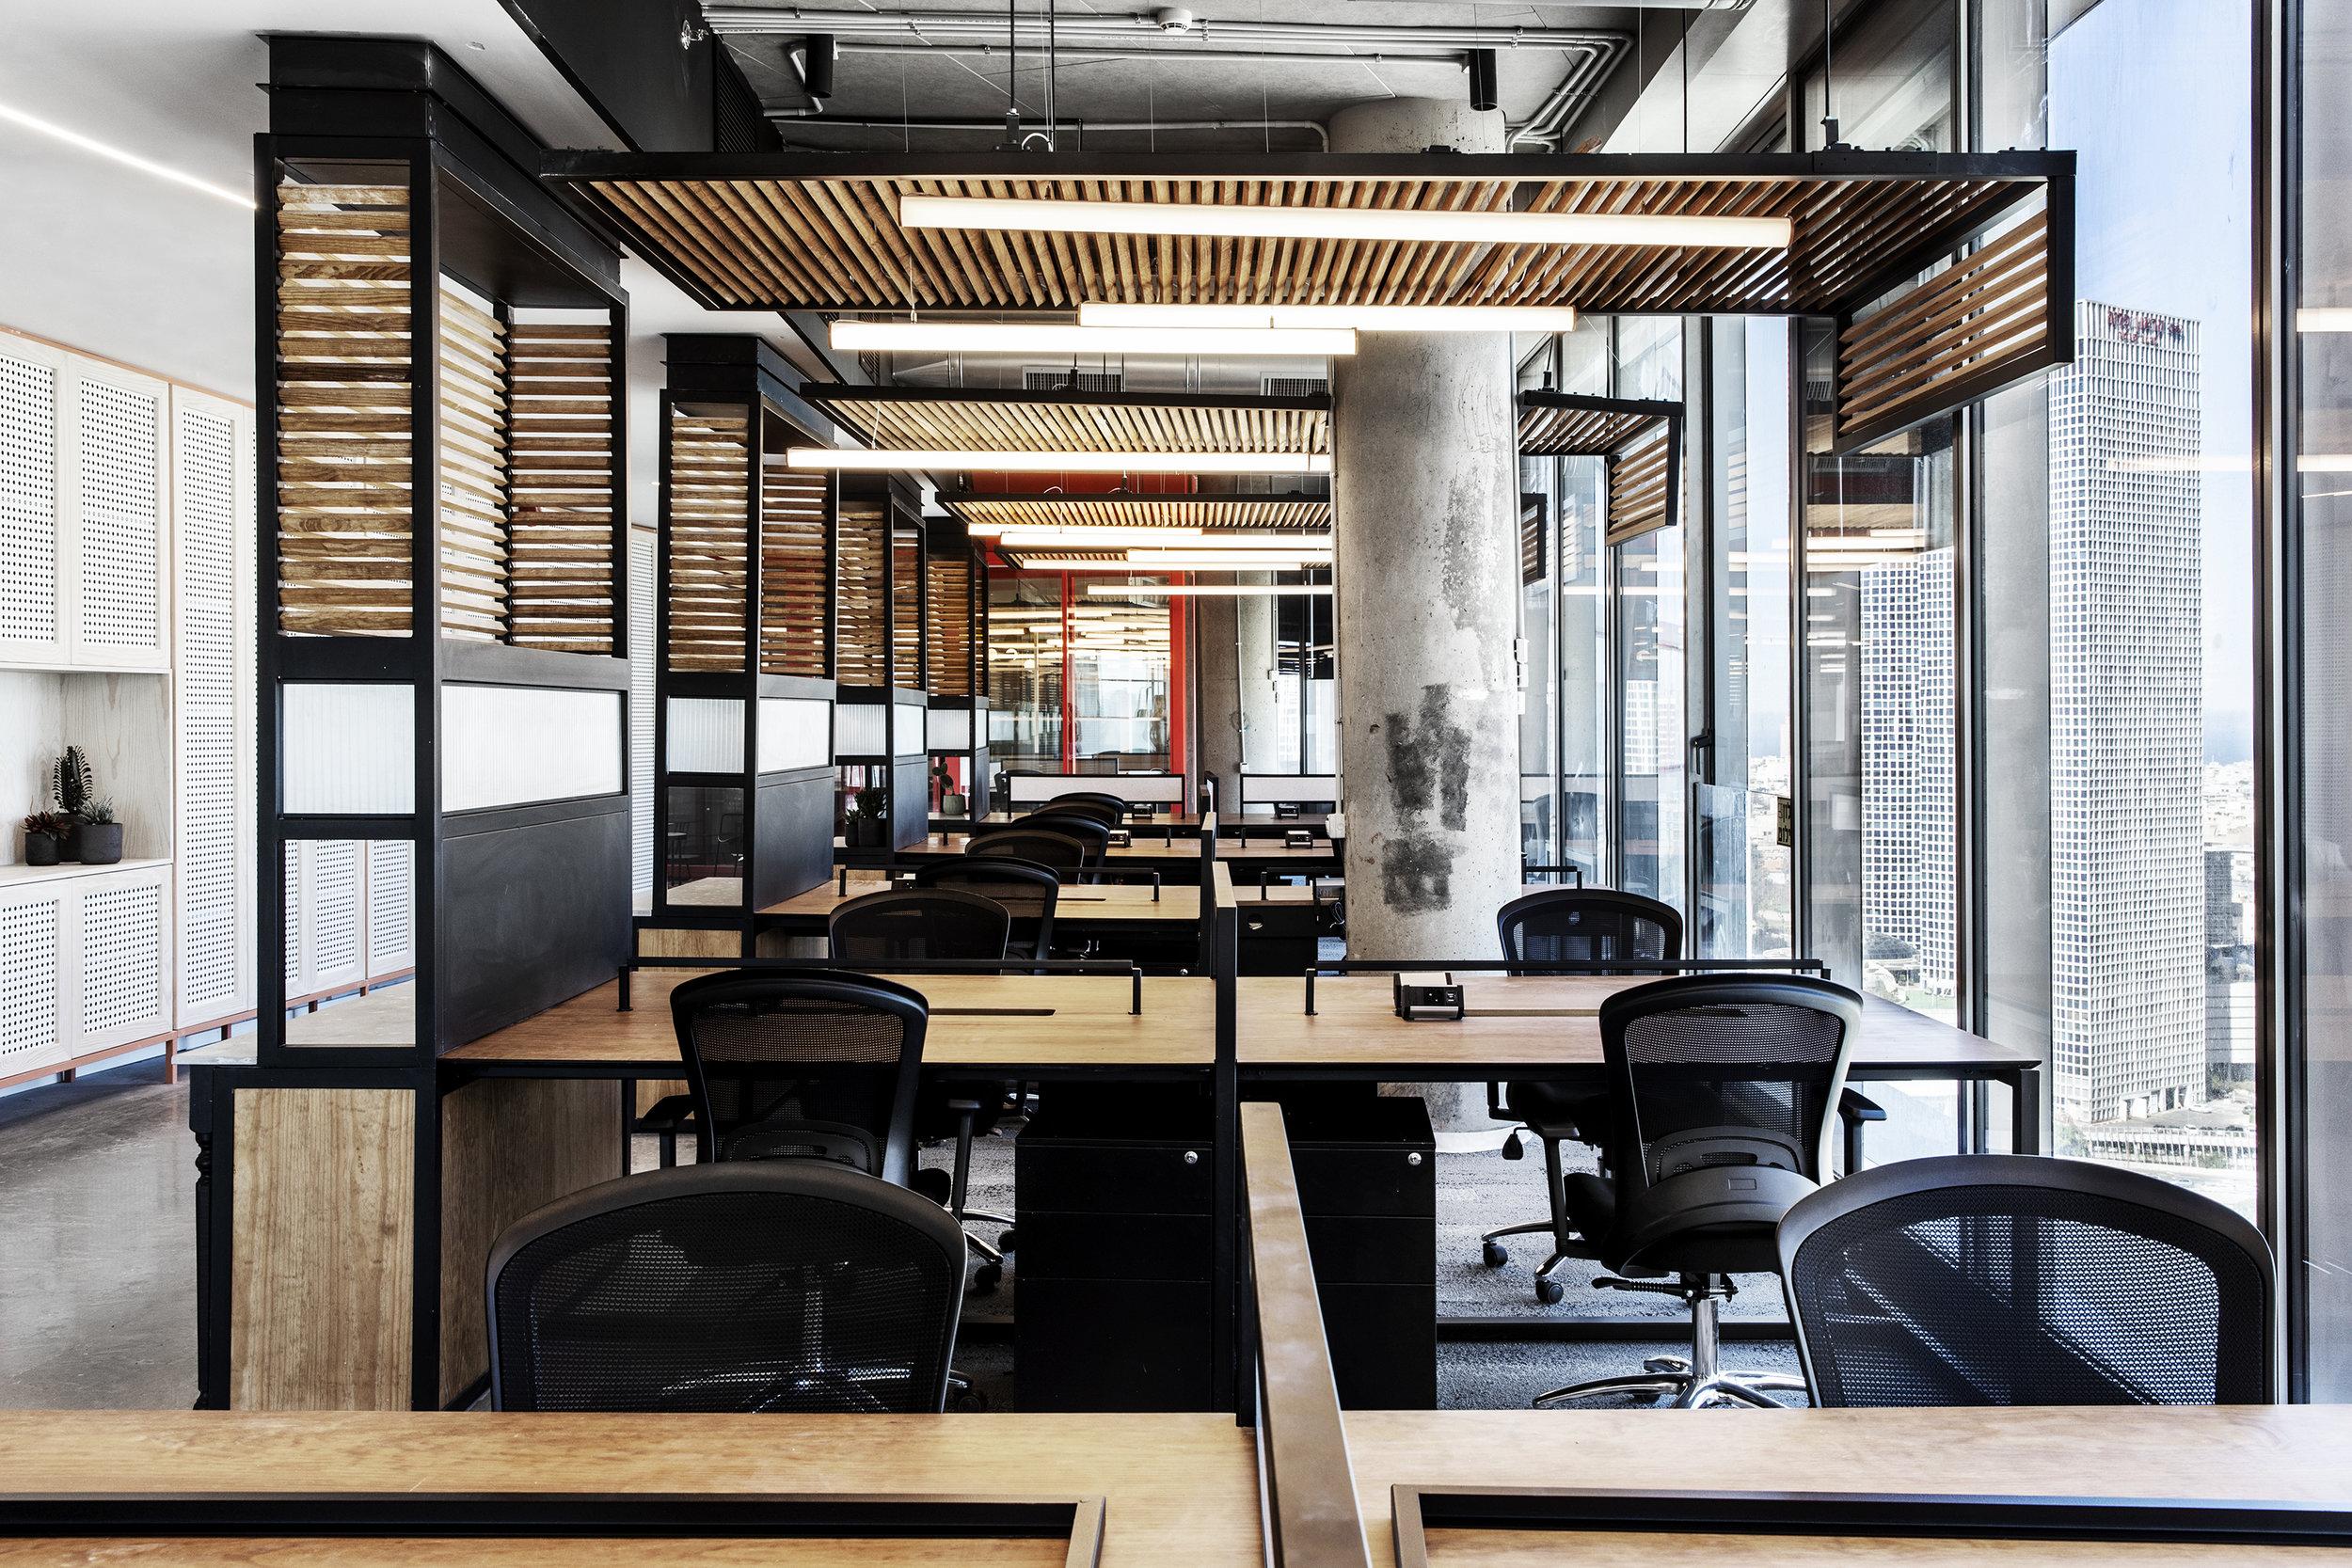 רואי דוד אדריכלות - אדריכל - נטורל אינטליג'נס - ROY DAVID - ARCHITECTURE - ARCHITECT - NI (8).jpg